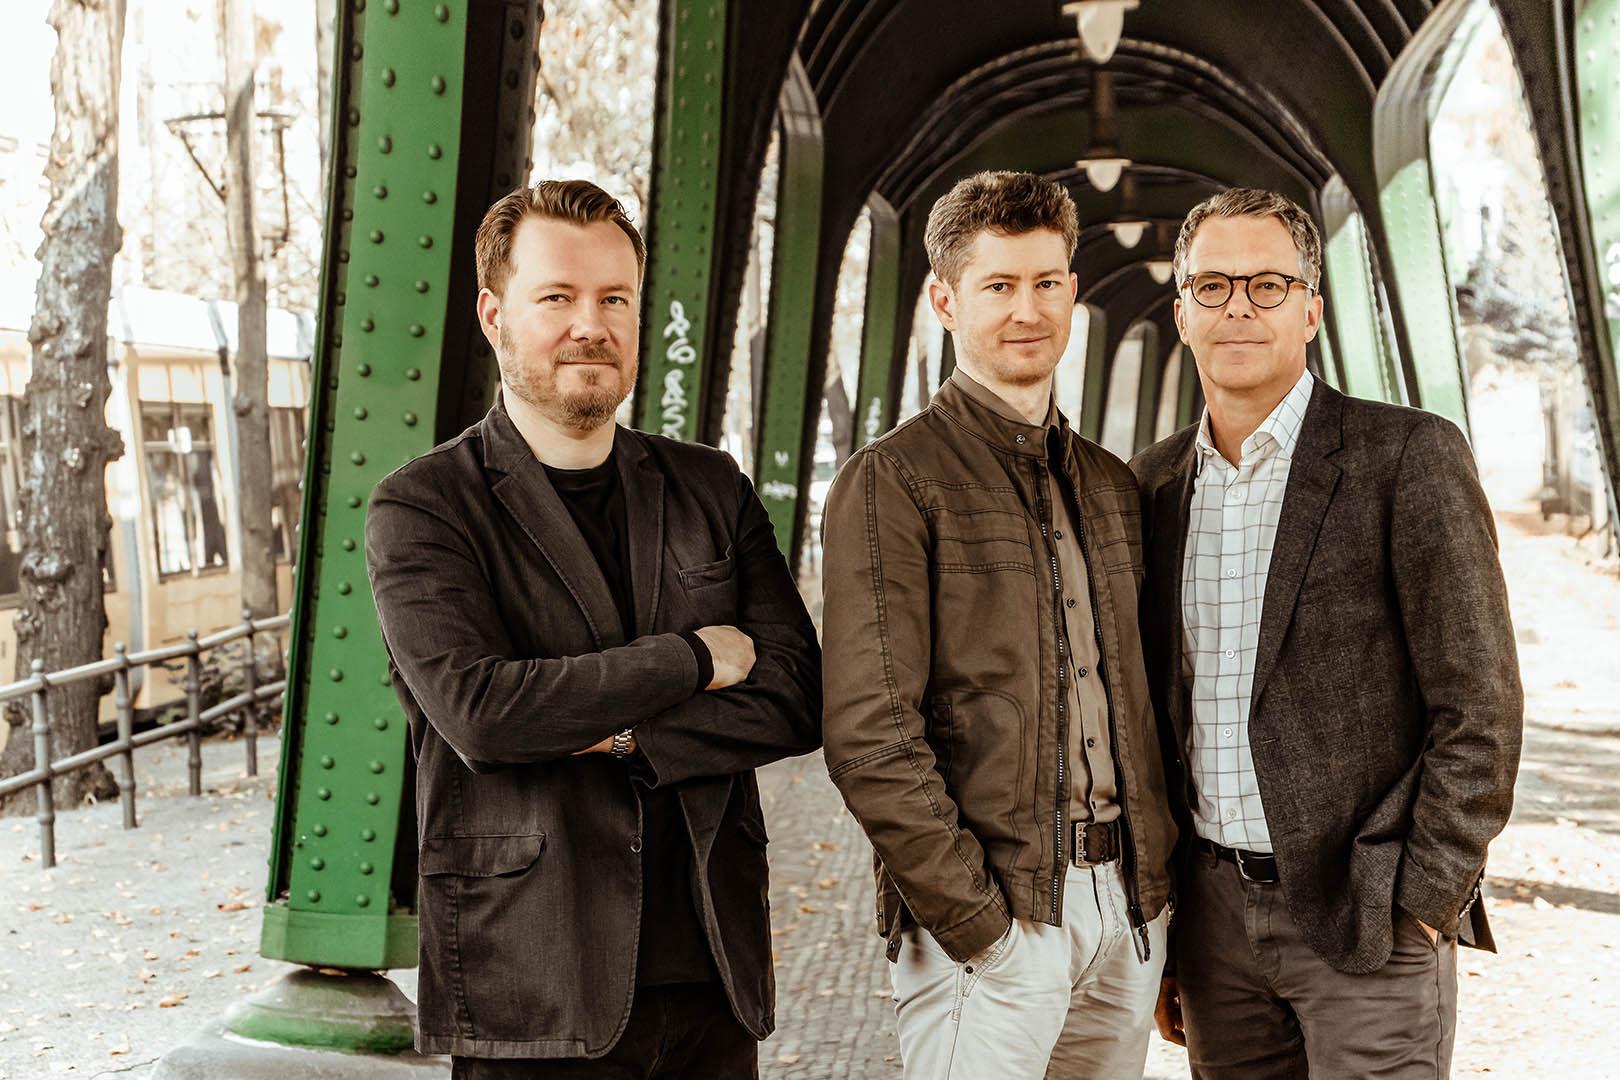 CollectiveCrunch, From left to right: Jarkko Lipponen, Christof Danzl and Rolf Schmitz. Photo: Tilo Riolo